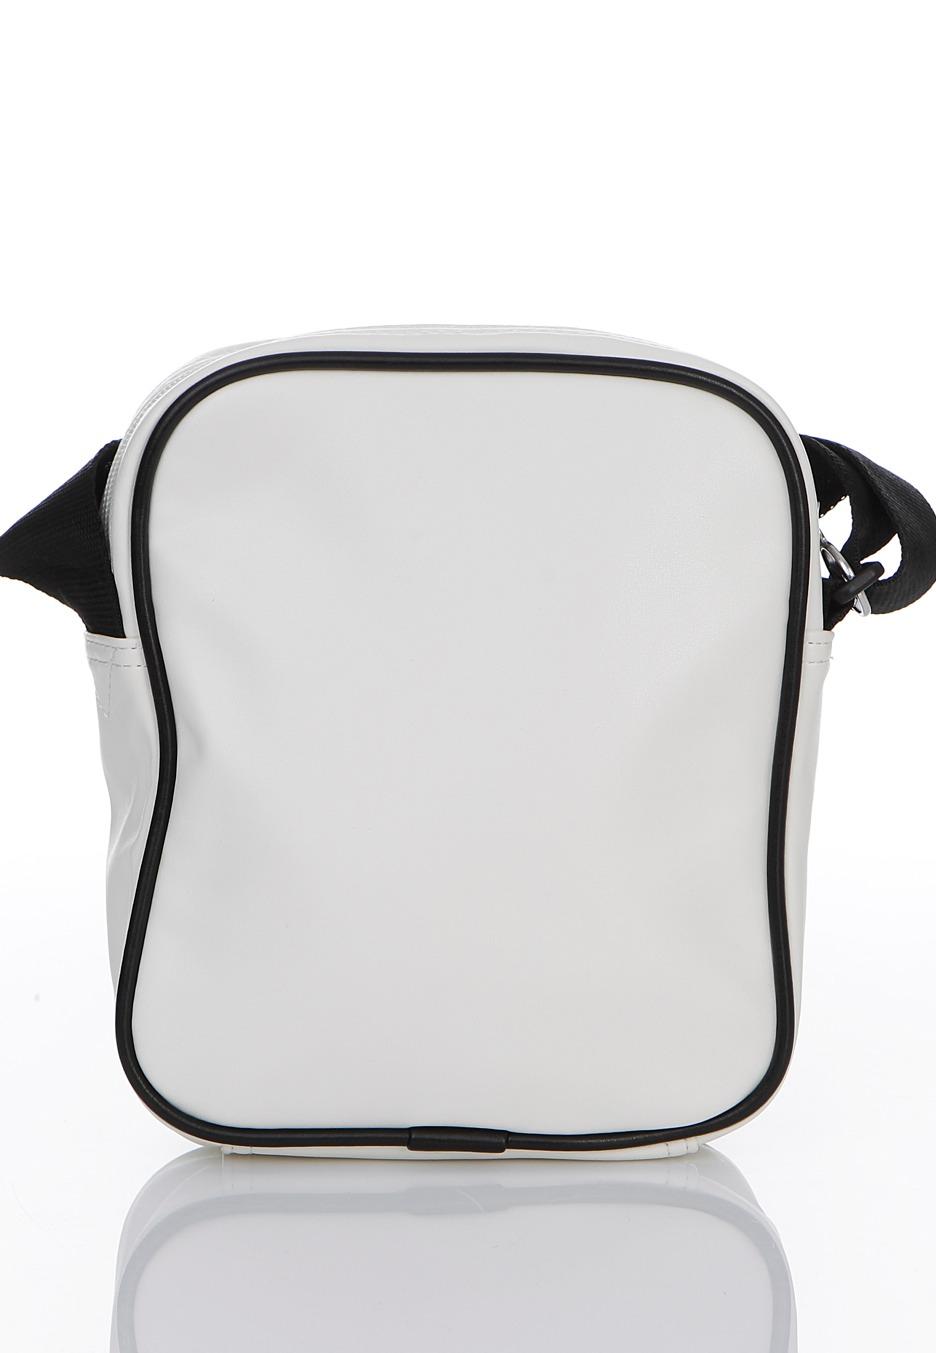 99ea3ab200 Puma - Campus Portable Whisper White Black - Sac - Boutique ...